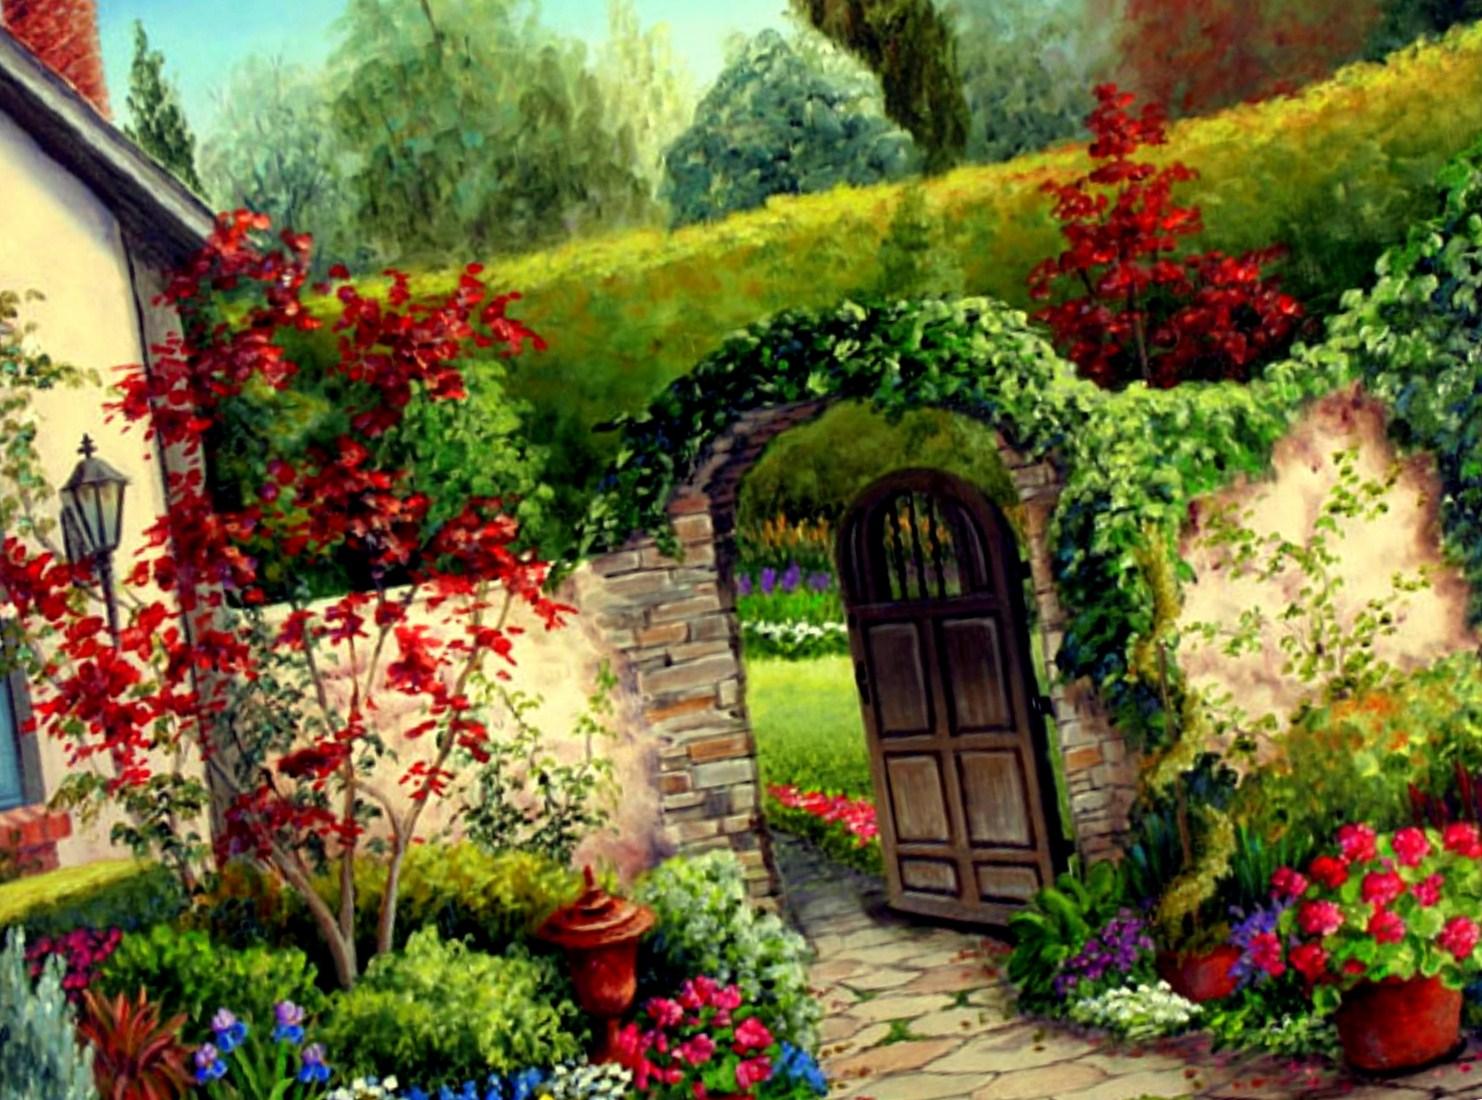 Garden Landscape Design Photos Garden Free Hd Wallpapers - Amazing Garden Of Flowers , HD Wallpaper & Backgrounds